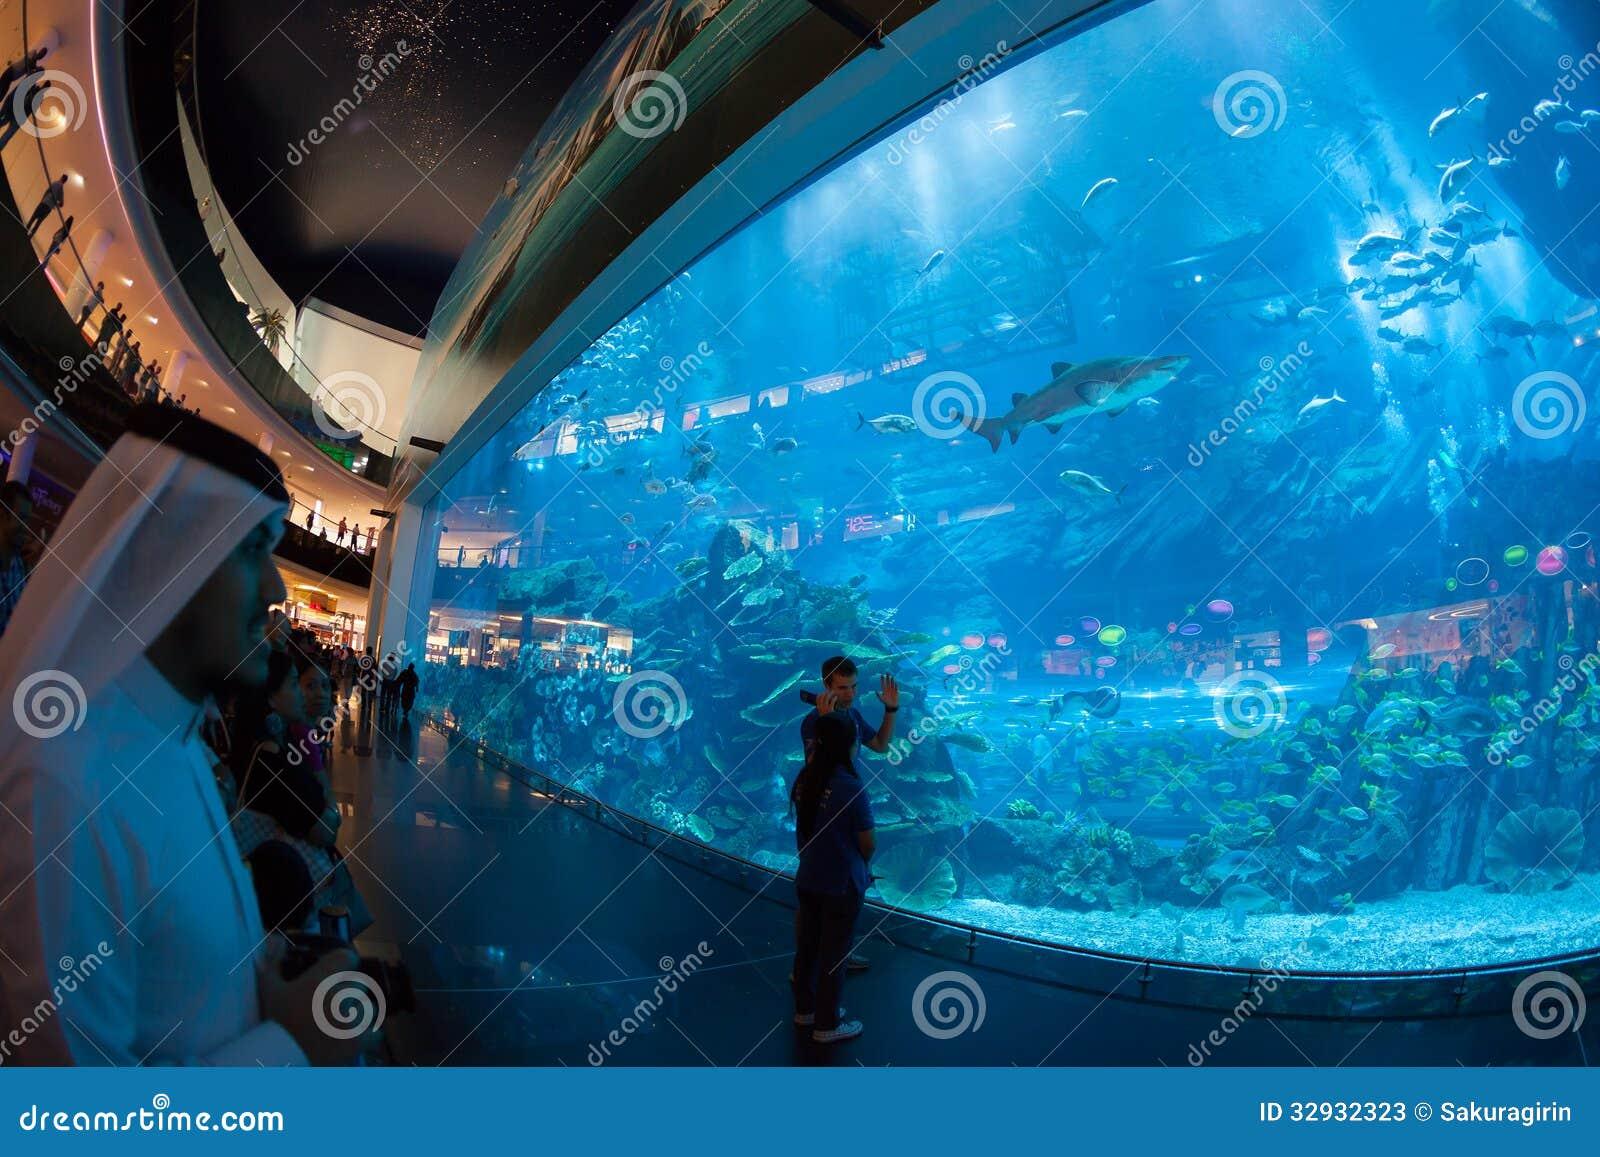 dubai aquarium und unter wasser zoo redaktionelles stockfoto bild 32932323. Black Bedroom Furniture Sets. Home Design Ideas